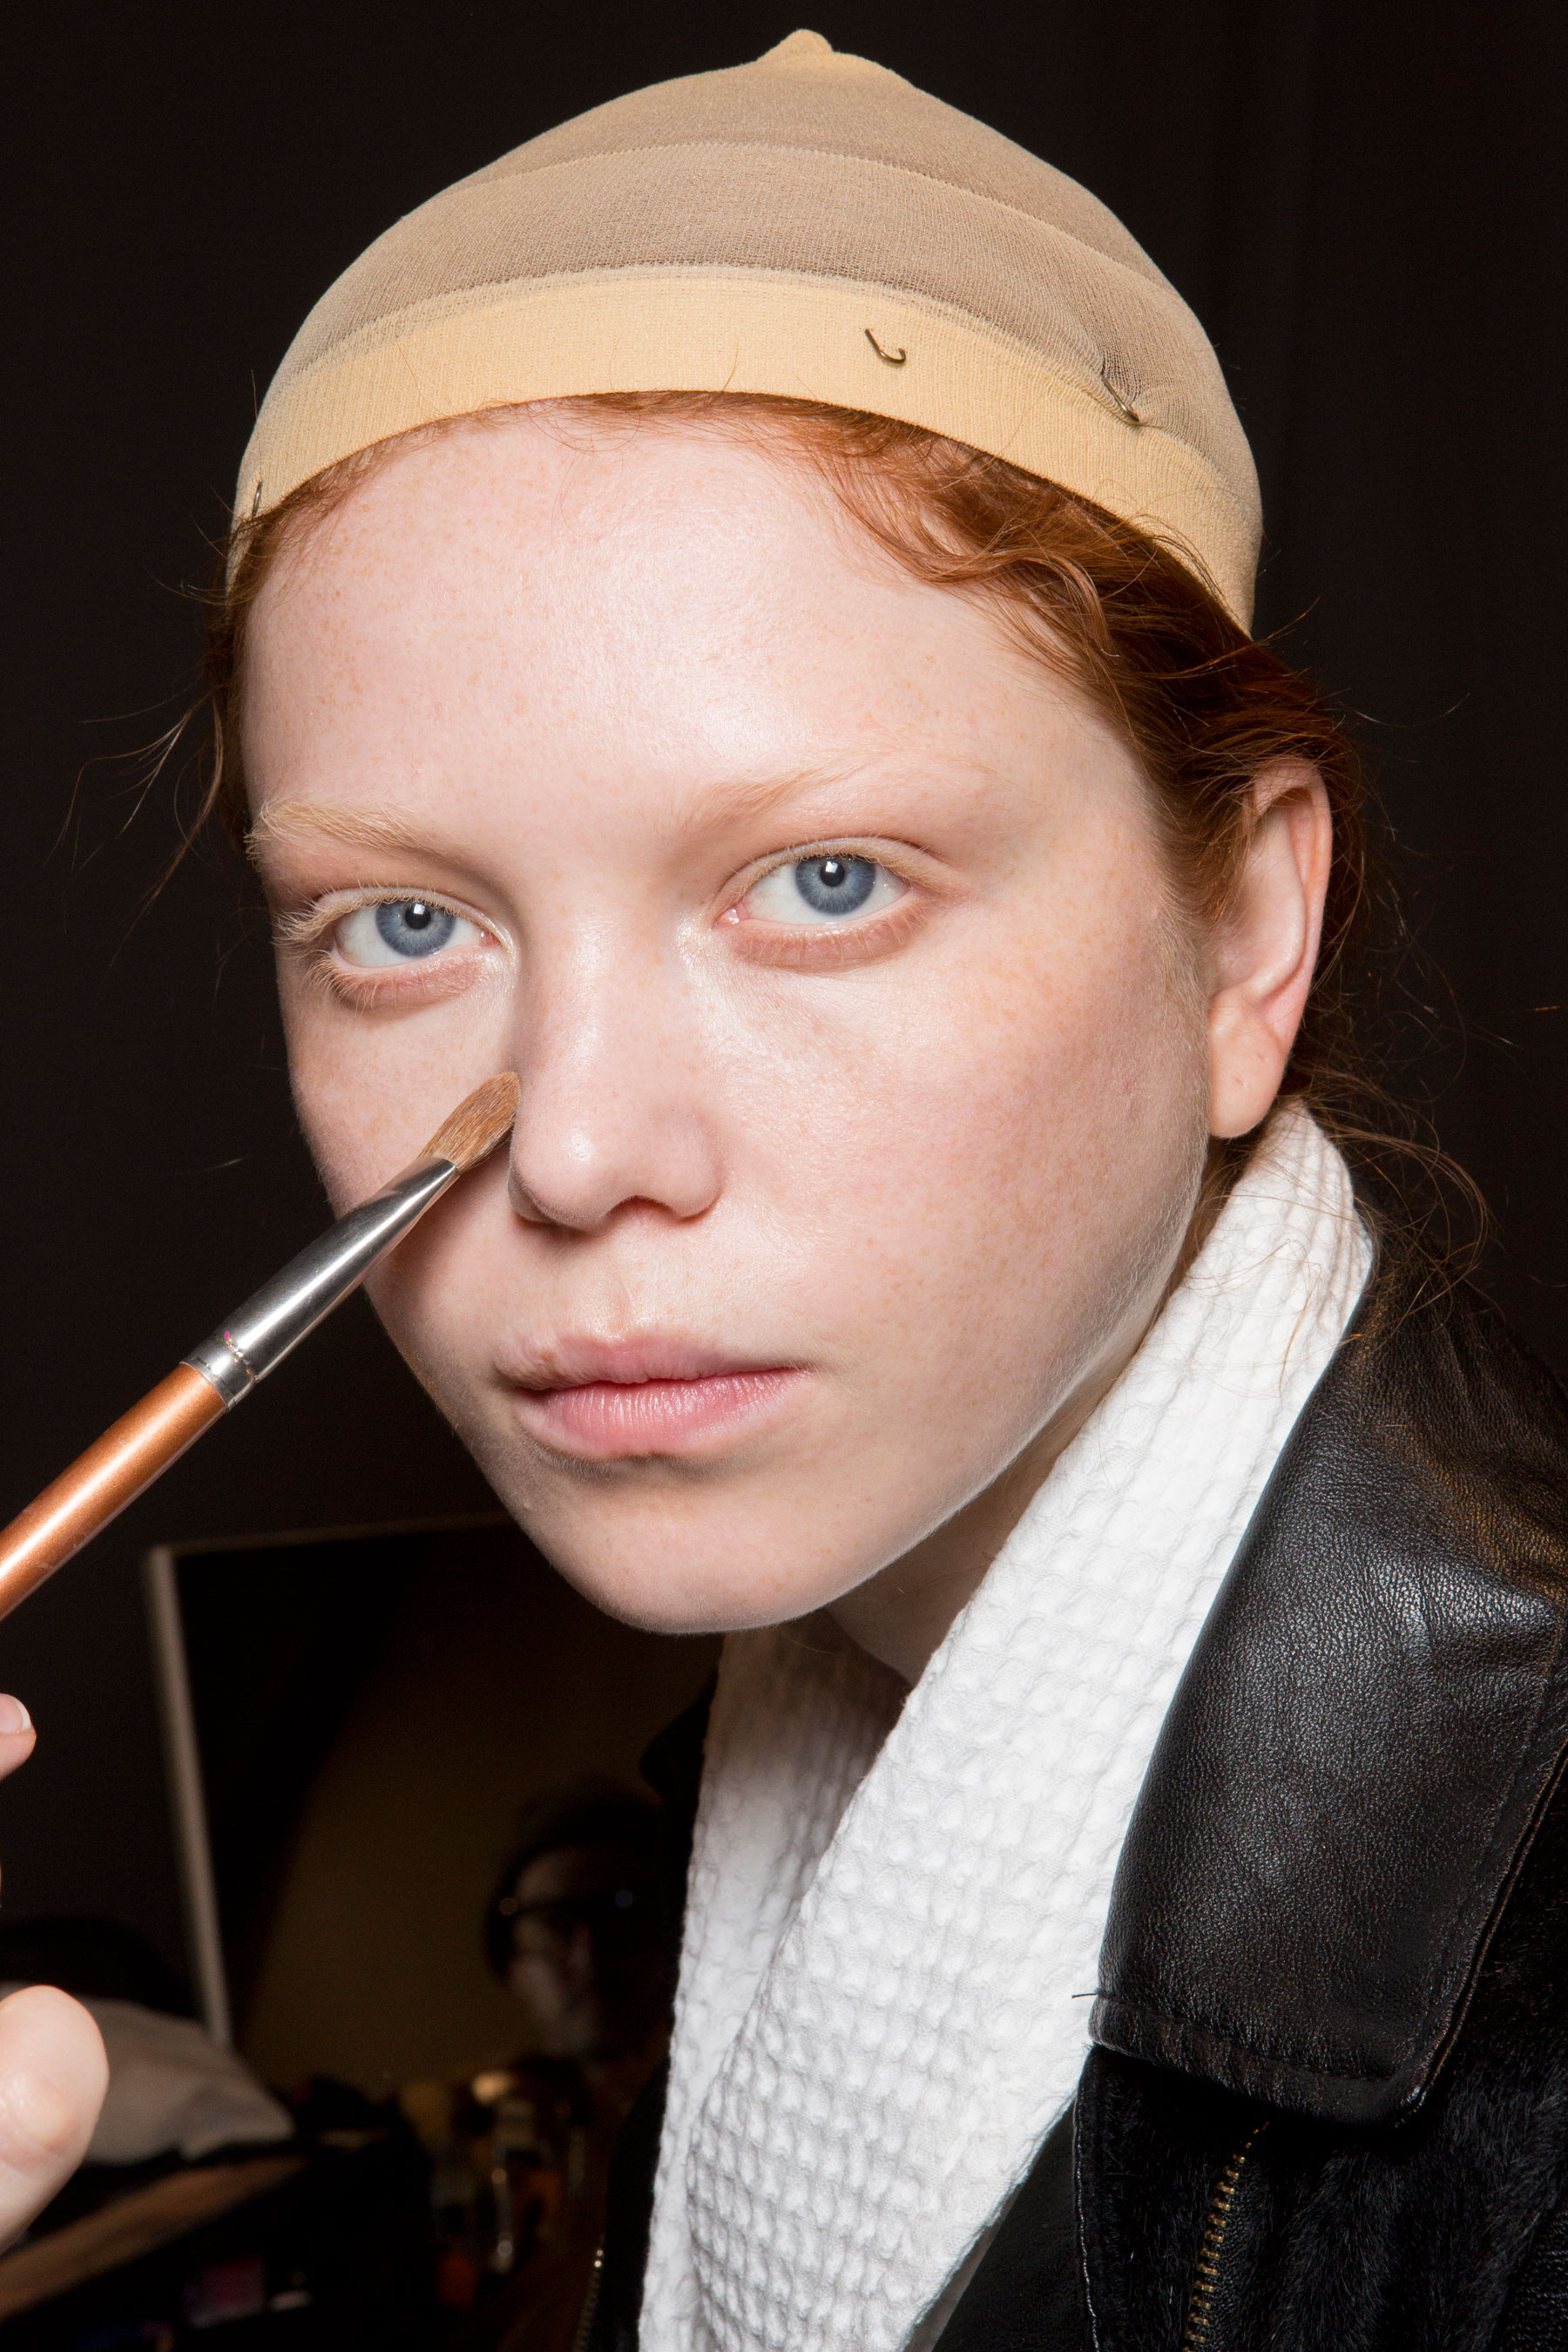 Gucci0-backsatge-beauty-spring-2016-fashion-show-the-impression-005